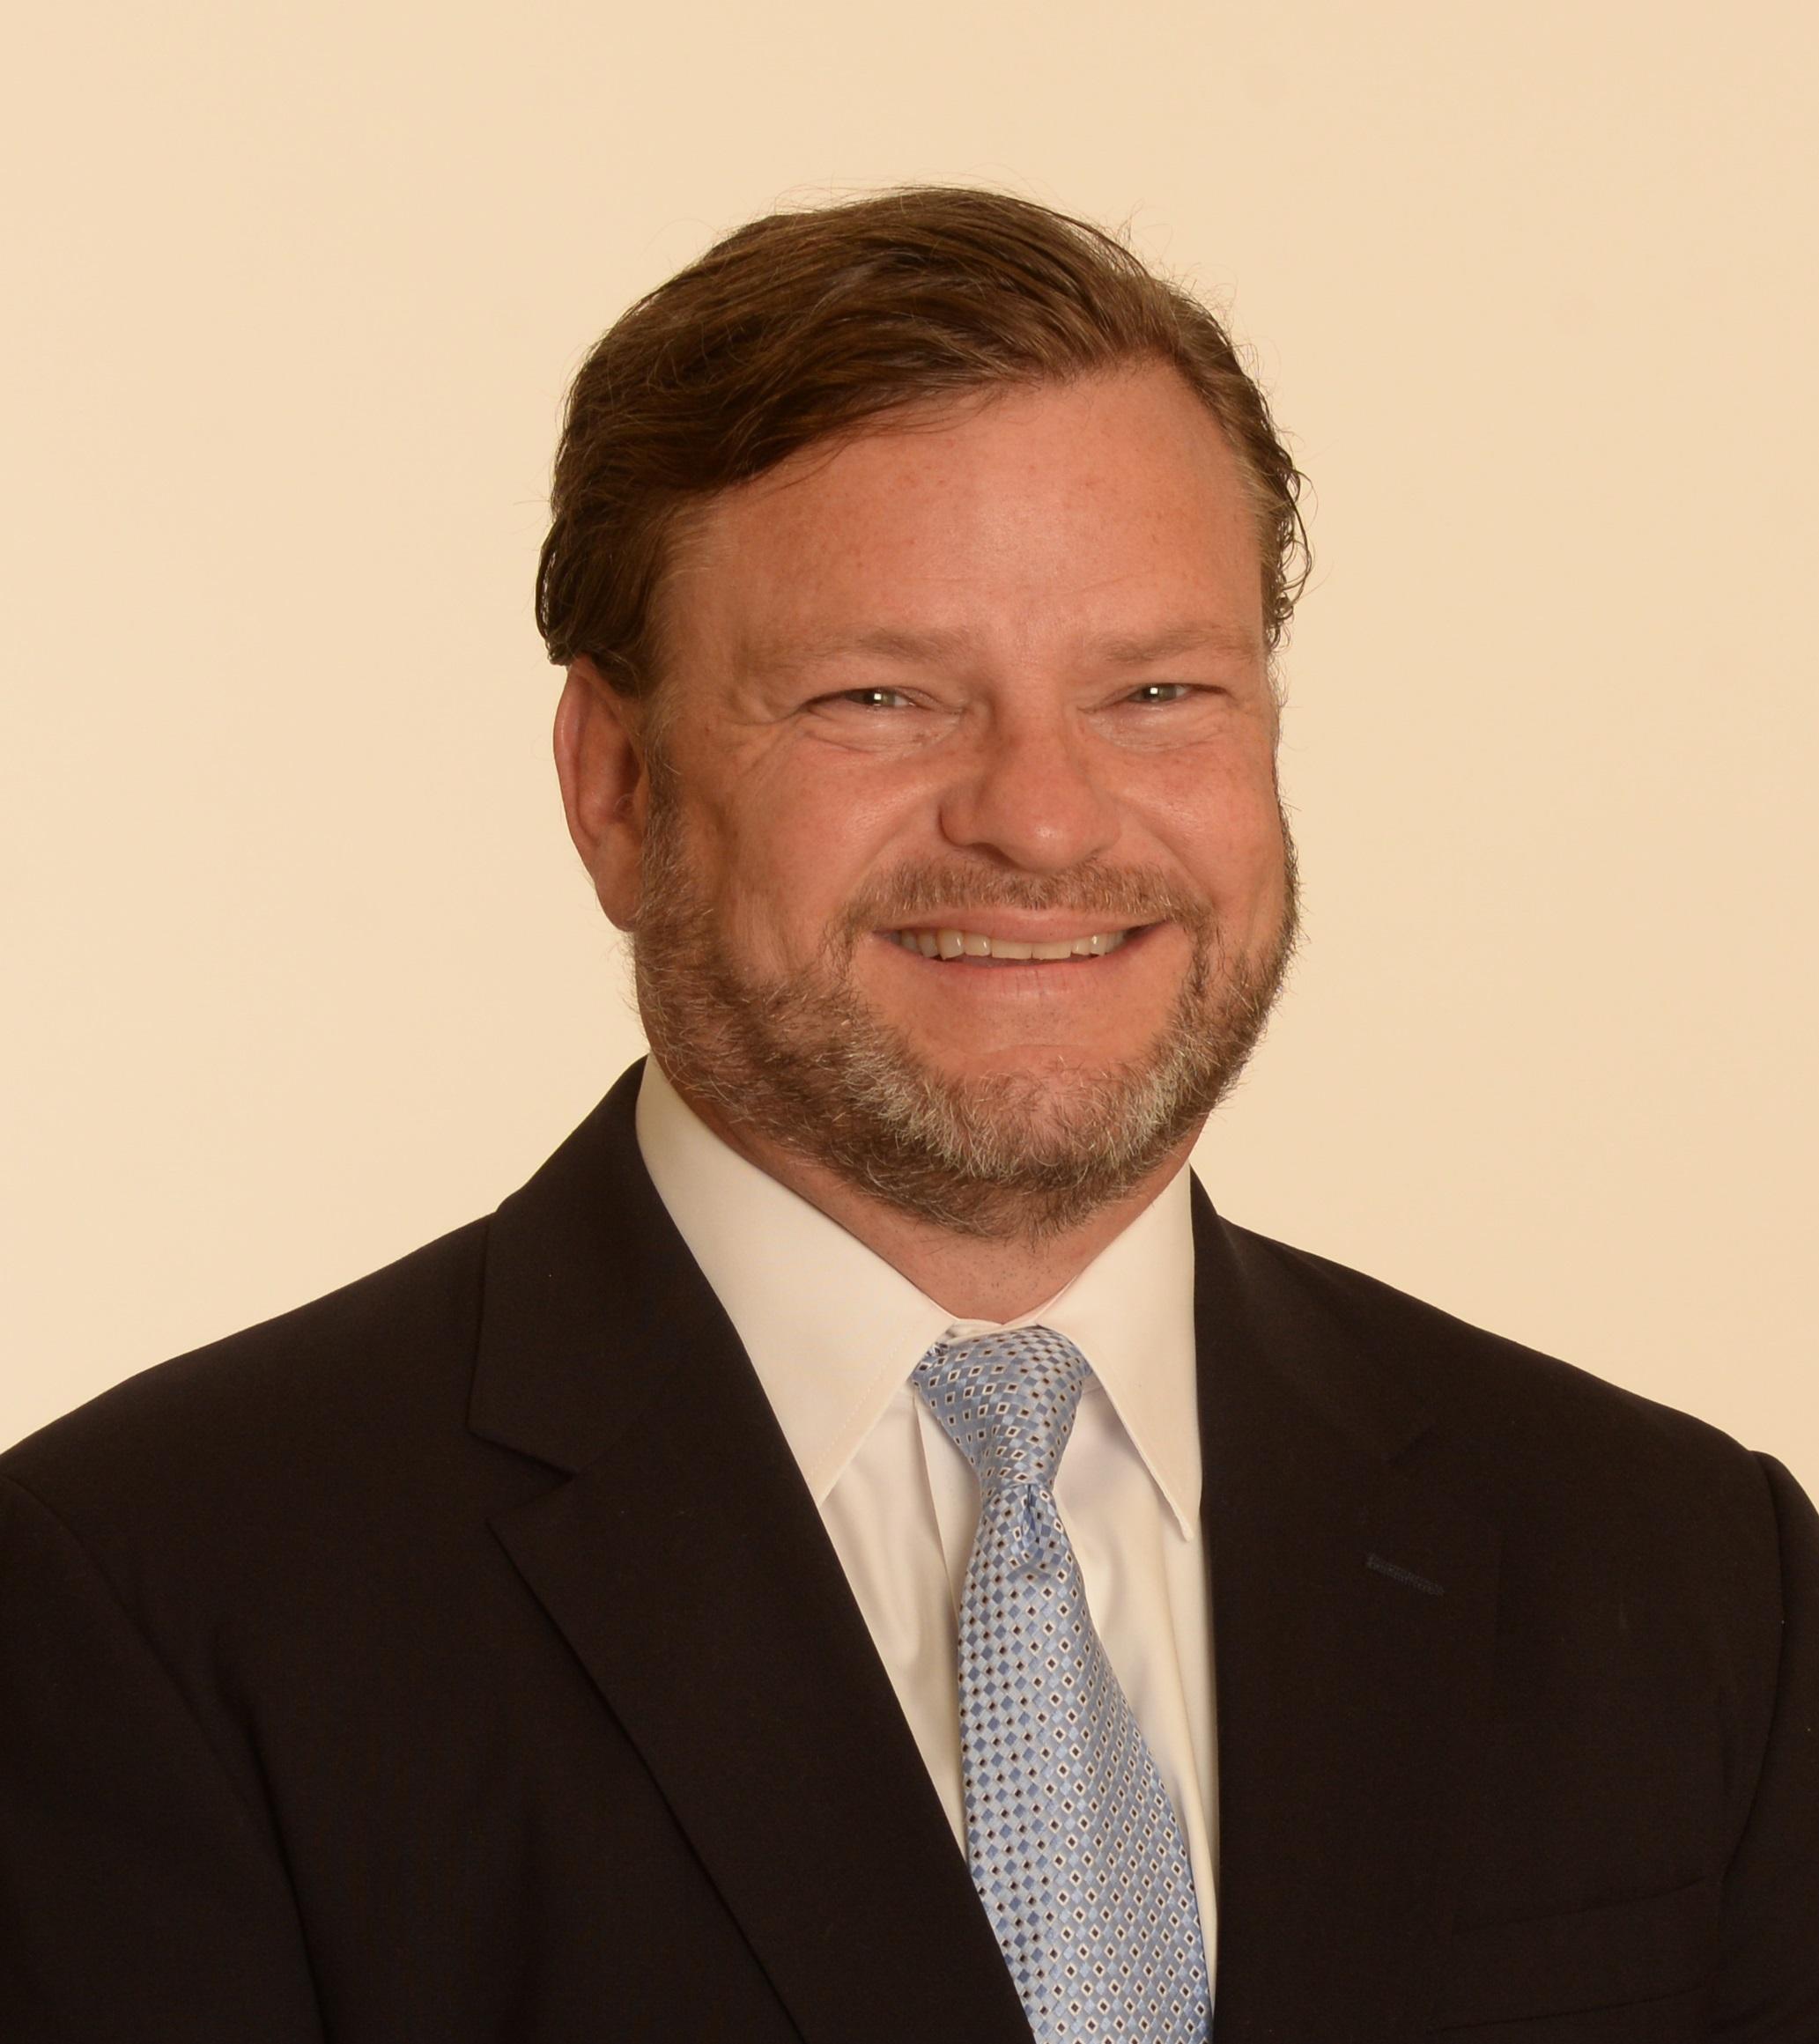 David Palmer, Genesee General Insurance